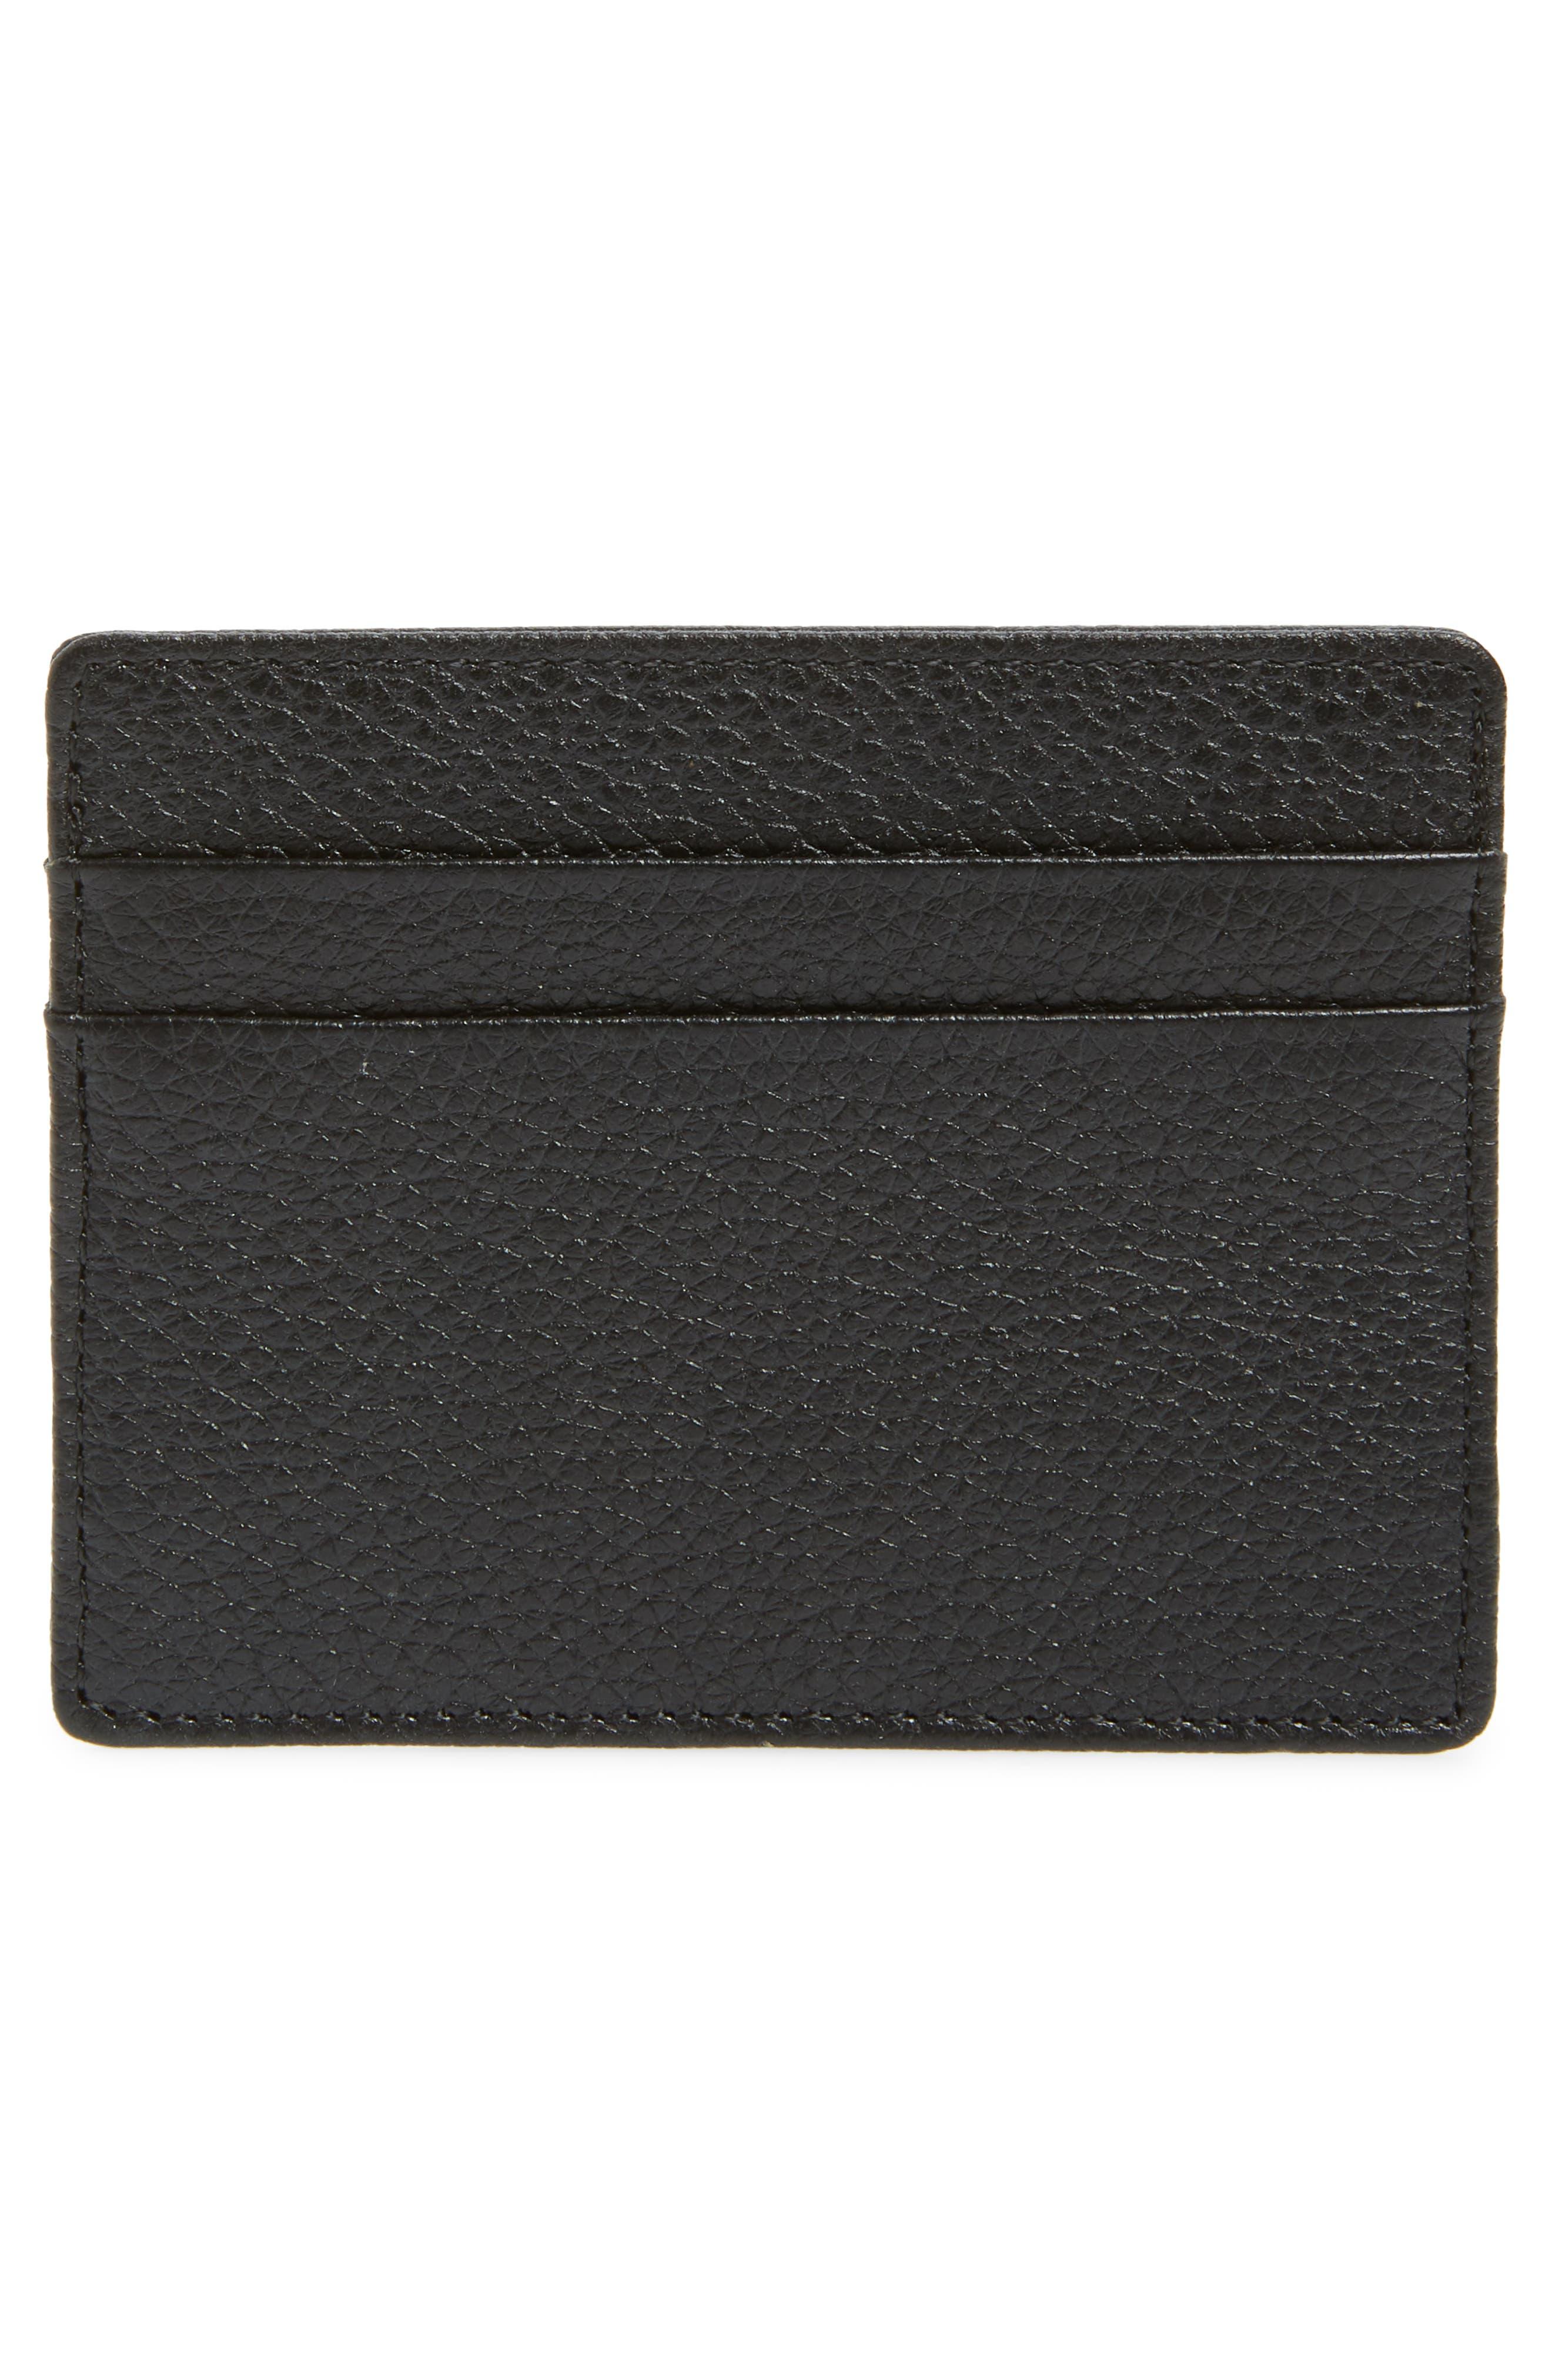 Jamie Leather Card Case,                             Alternate thumbnail 2, color,                             BLACK CAVIAR